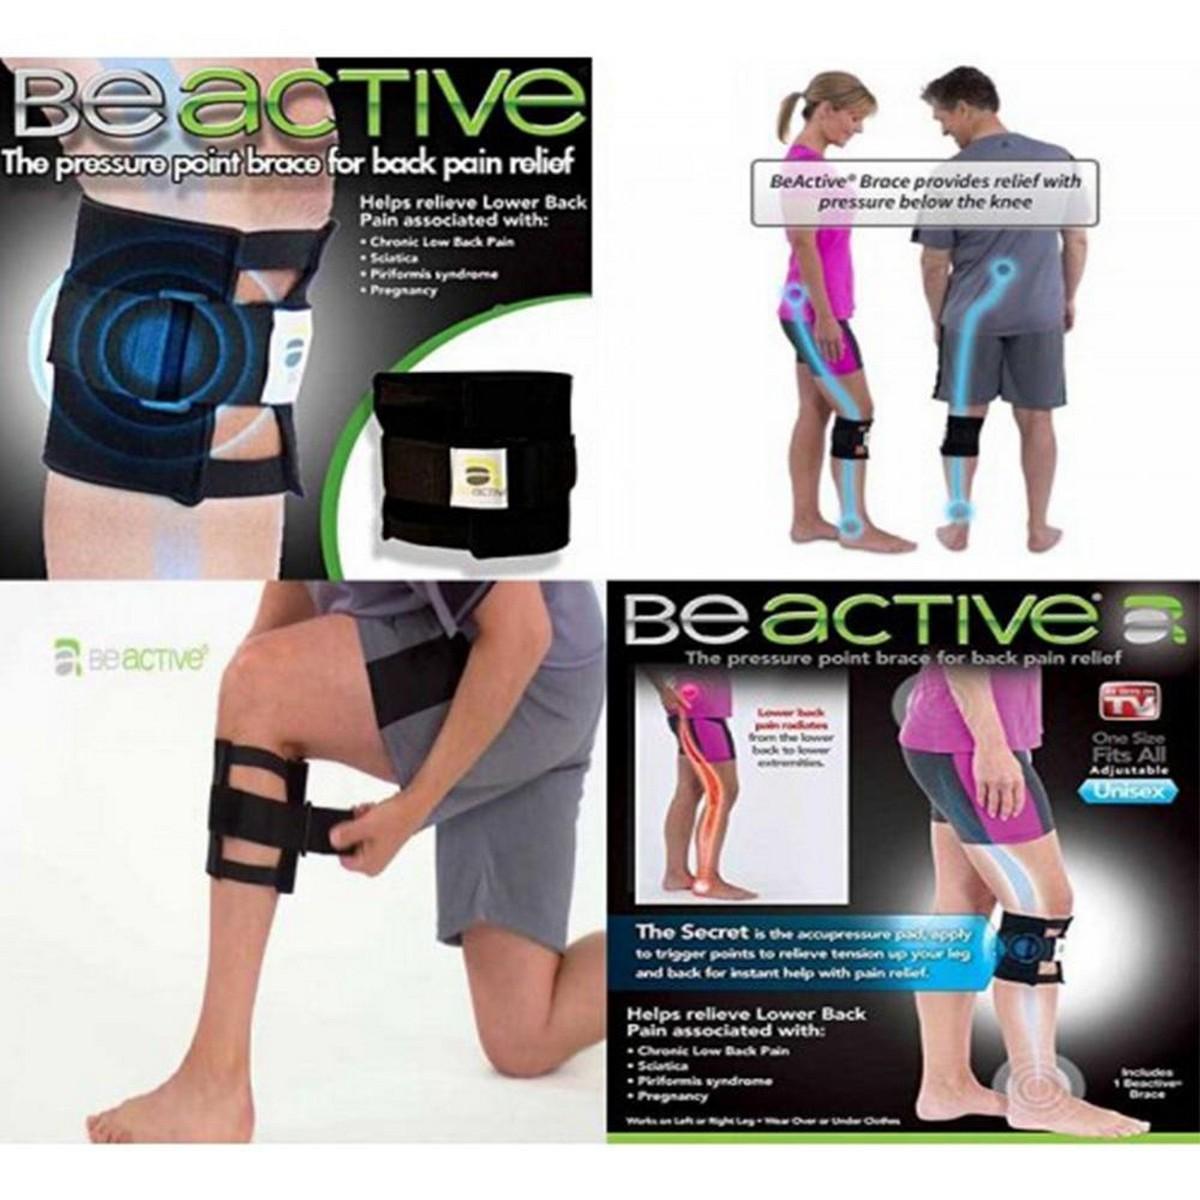 Beactive Pressure Point Brace Back Pain Acupressure Sciatic Nerve Be Active Elbow Knee LEG Pad